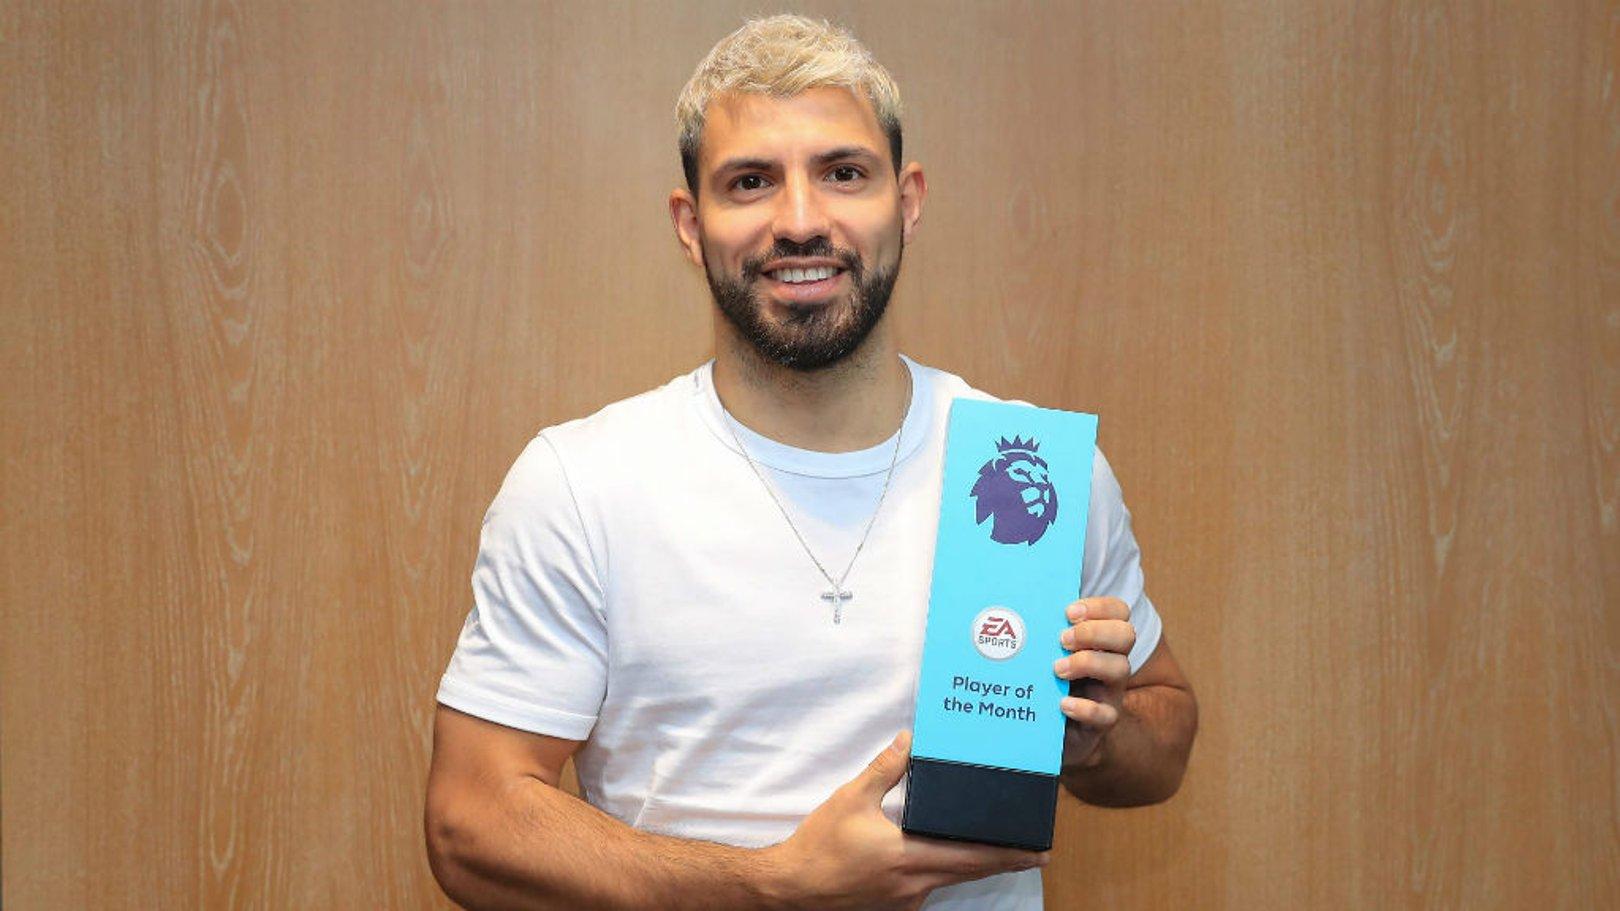 POTM: Sergio Aguero has won February's Player of the Month award